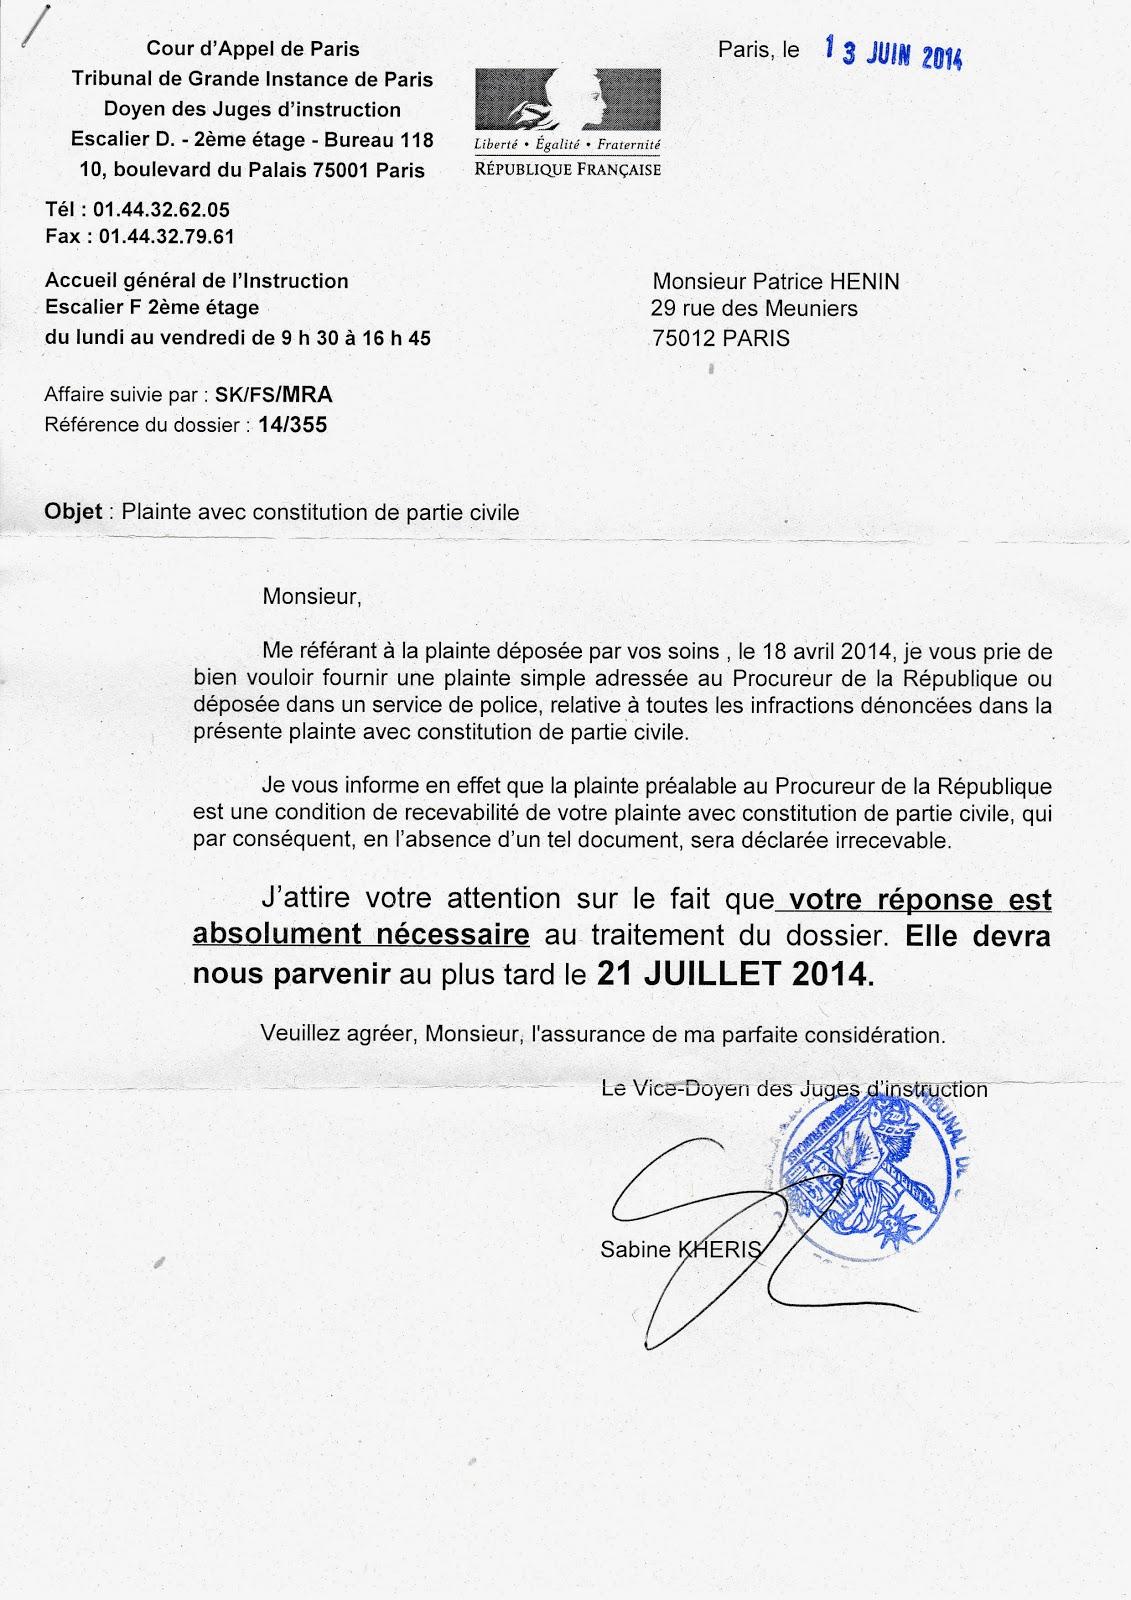 Depot de plainte en francais la prefecture de police - Bureau des permis de conduire de la prefecture de police ...